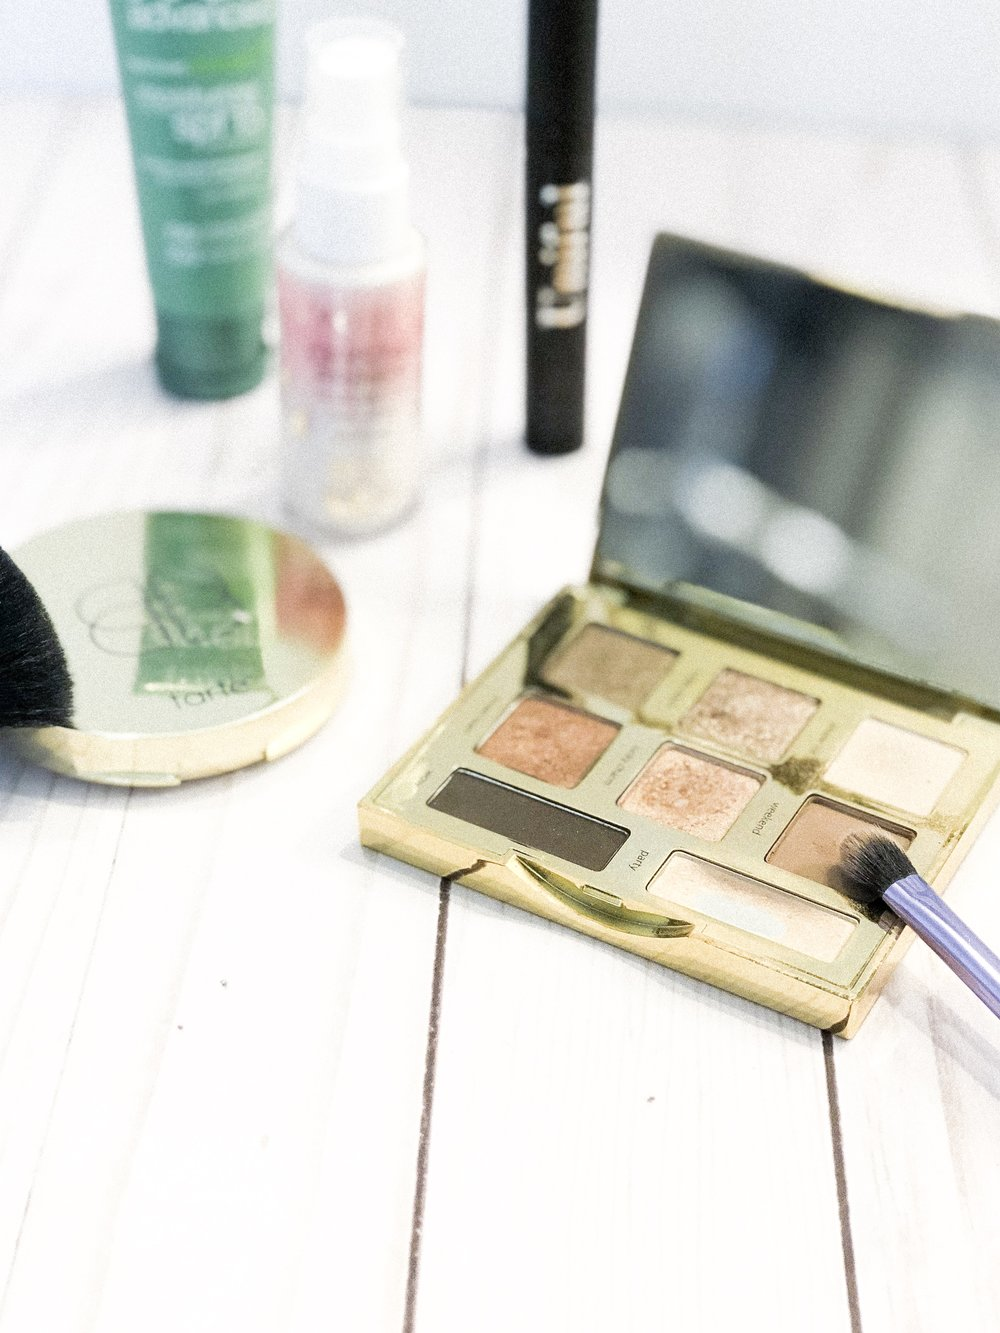 Vegan Beauty Essentials - Image by Amanda Kaplan